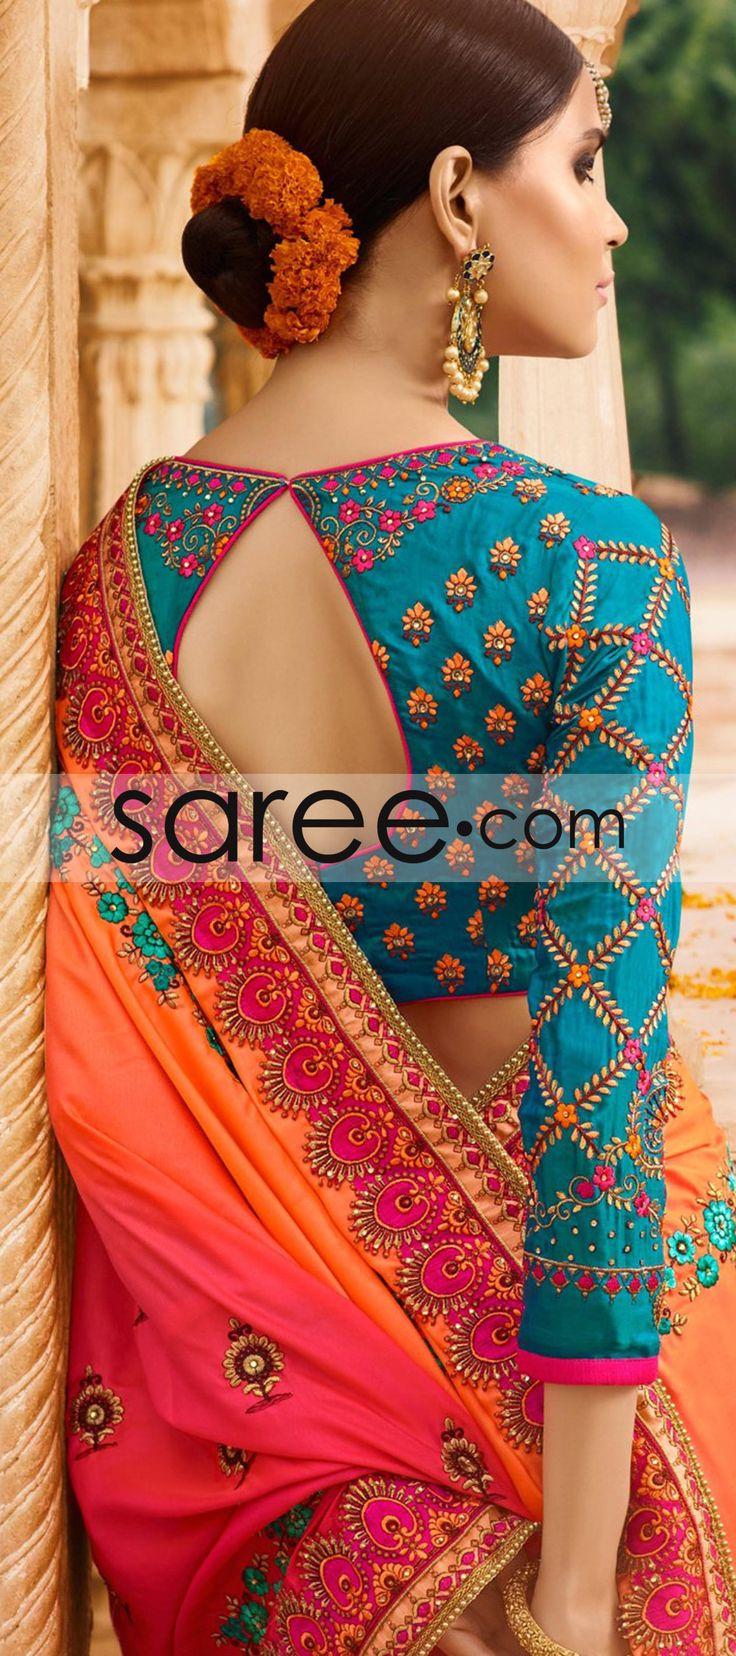 ORANGE AND BLUE SILK SAREE WITH RESHAM EMBROIDERY WORK #Saree #GeorgetteSarees #IndianSaree #Sarees #SilkSarees #PartywearSarees #RegularwearSarees #officeWearSarees #WeddingSarees #BuyOnline #OnlieSarees #NetSarees #ChiffonSarees #DesignerSarees #SareeFashion